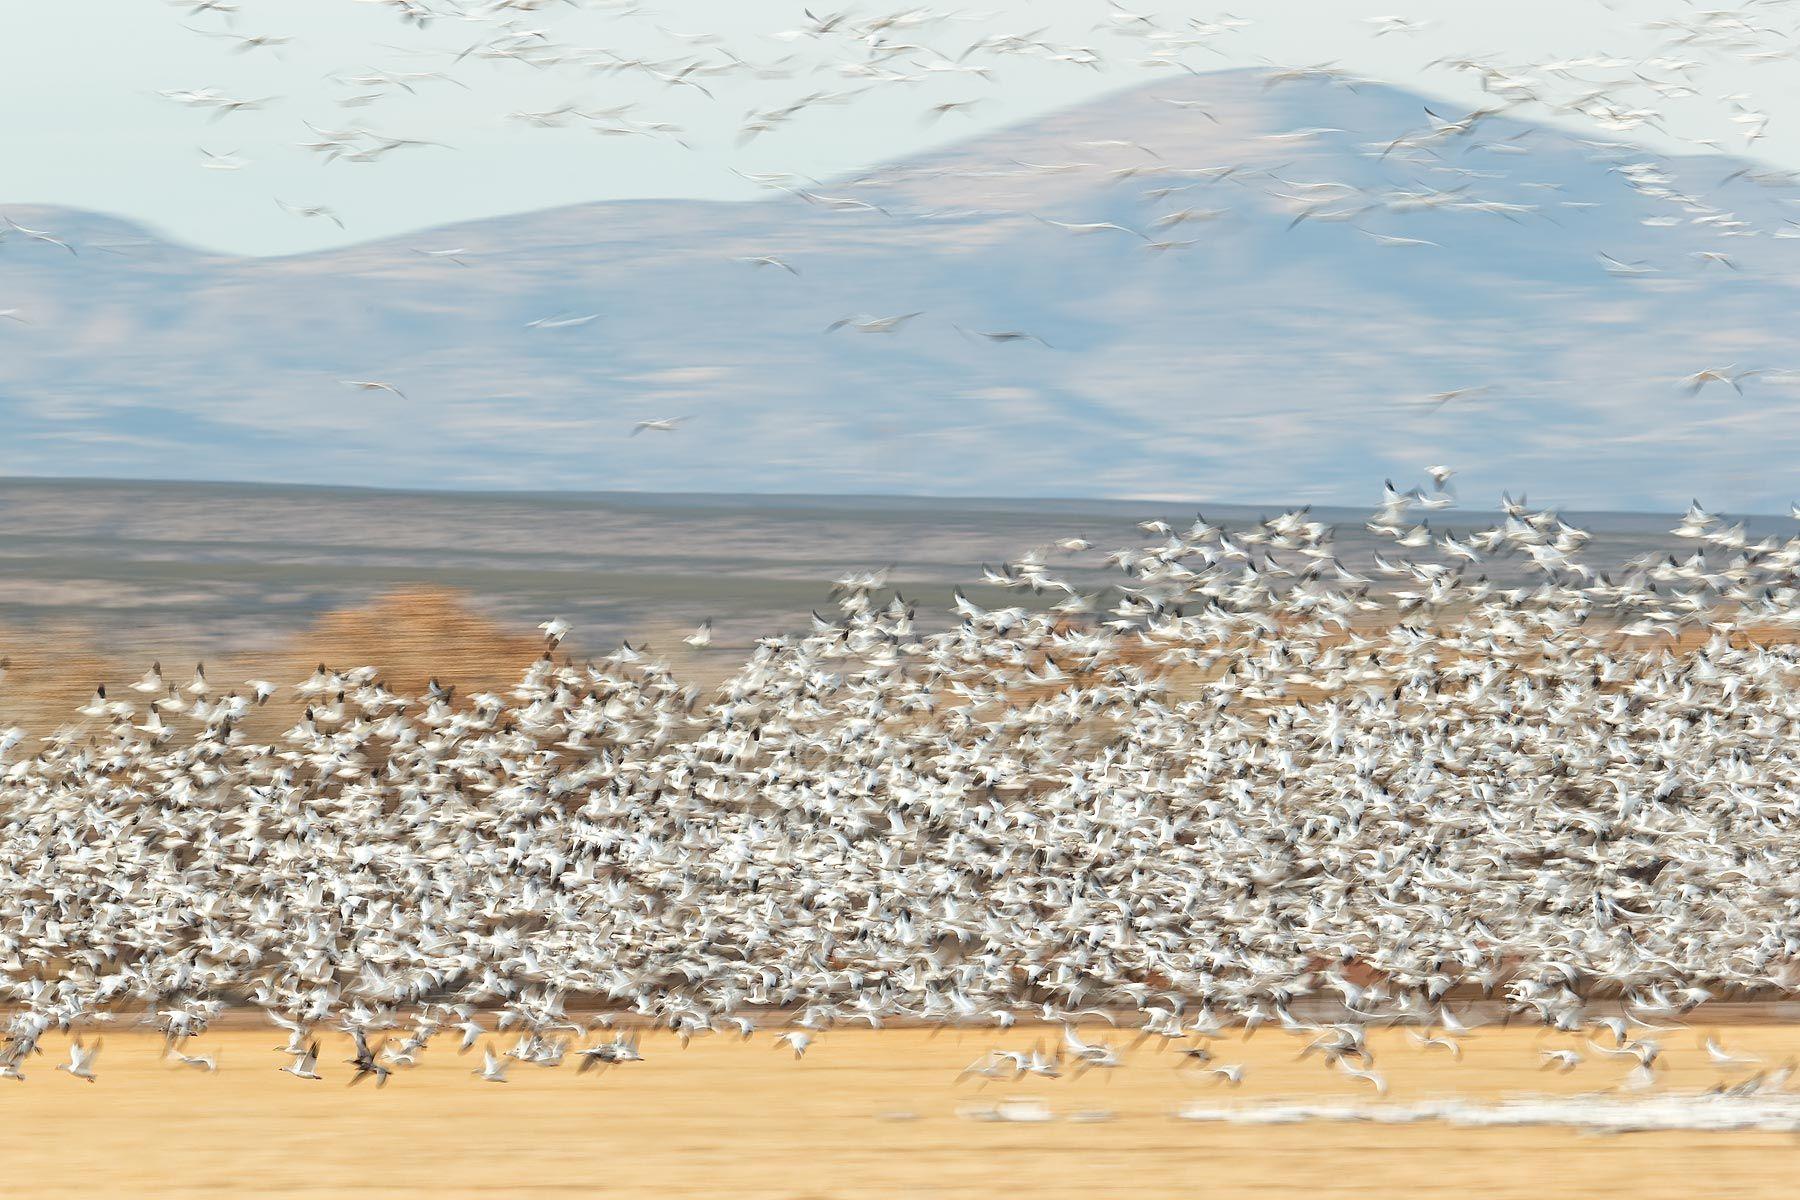 Snow-geese-blur-over-the-cornfields_E7T4287-Bosque-del-Apache-NWR,-San-Antonio,-NM,-USA.jpg